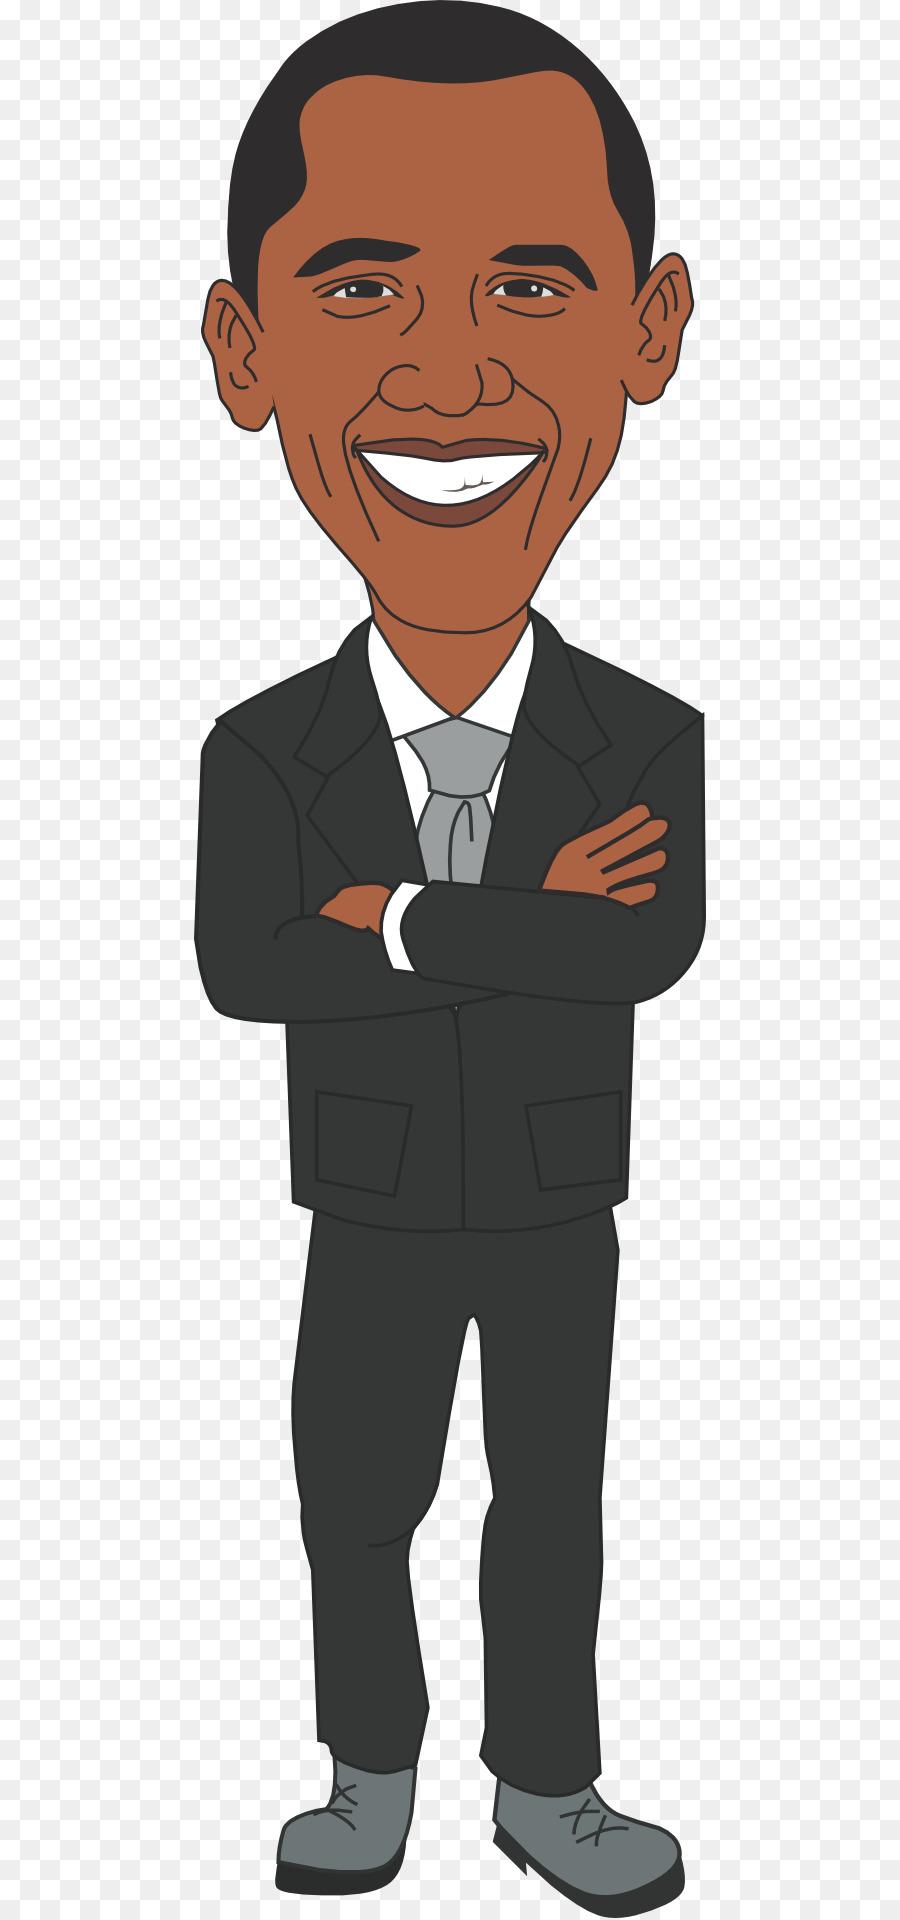 Barack Obama President of the United States Clip art - Barack Obama Cliparts